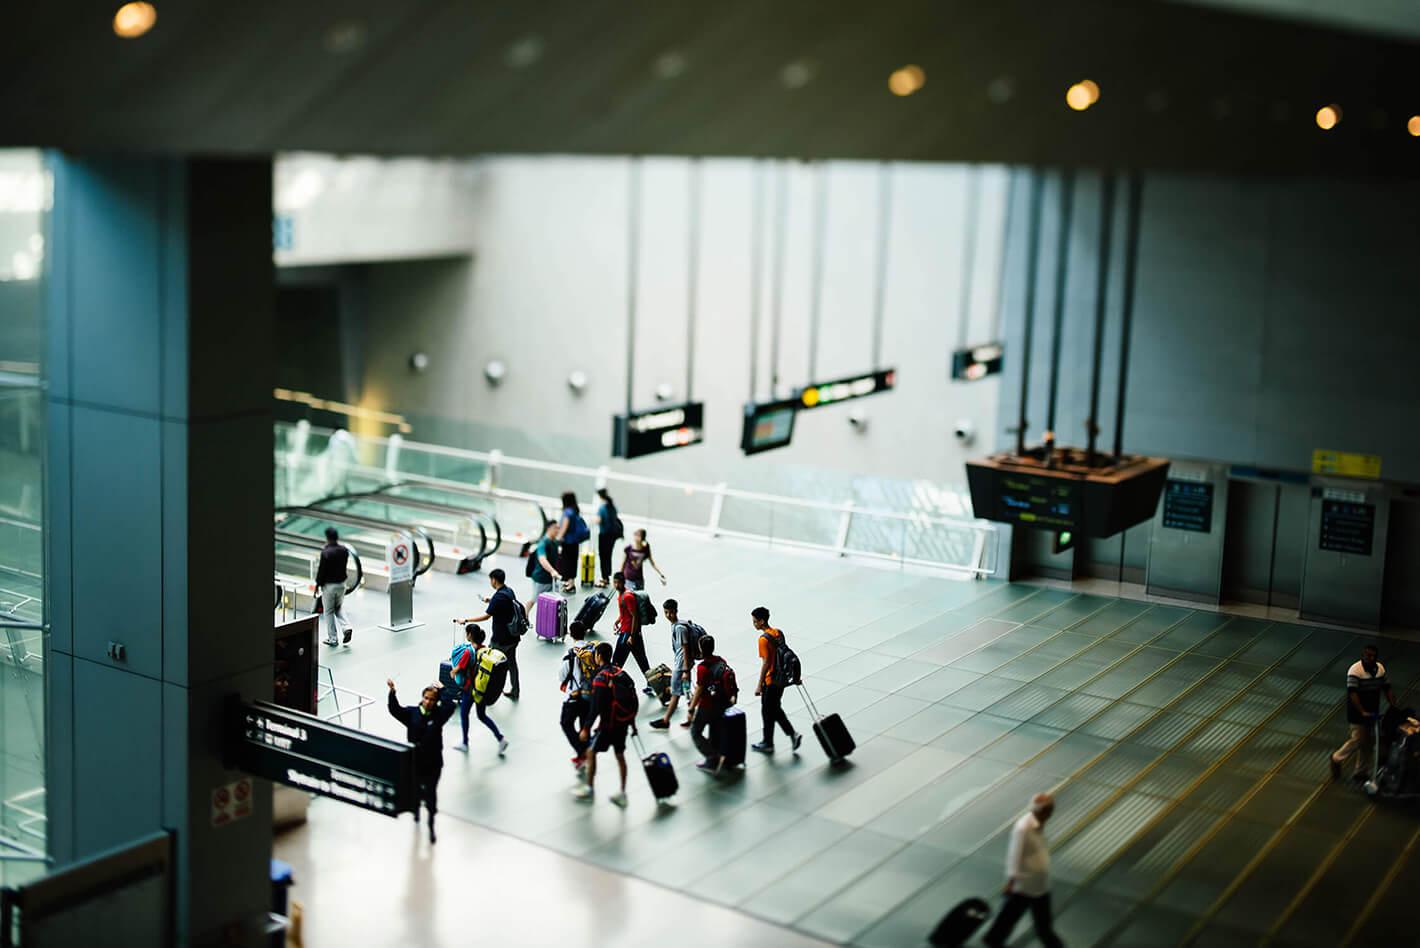 Flughafengate